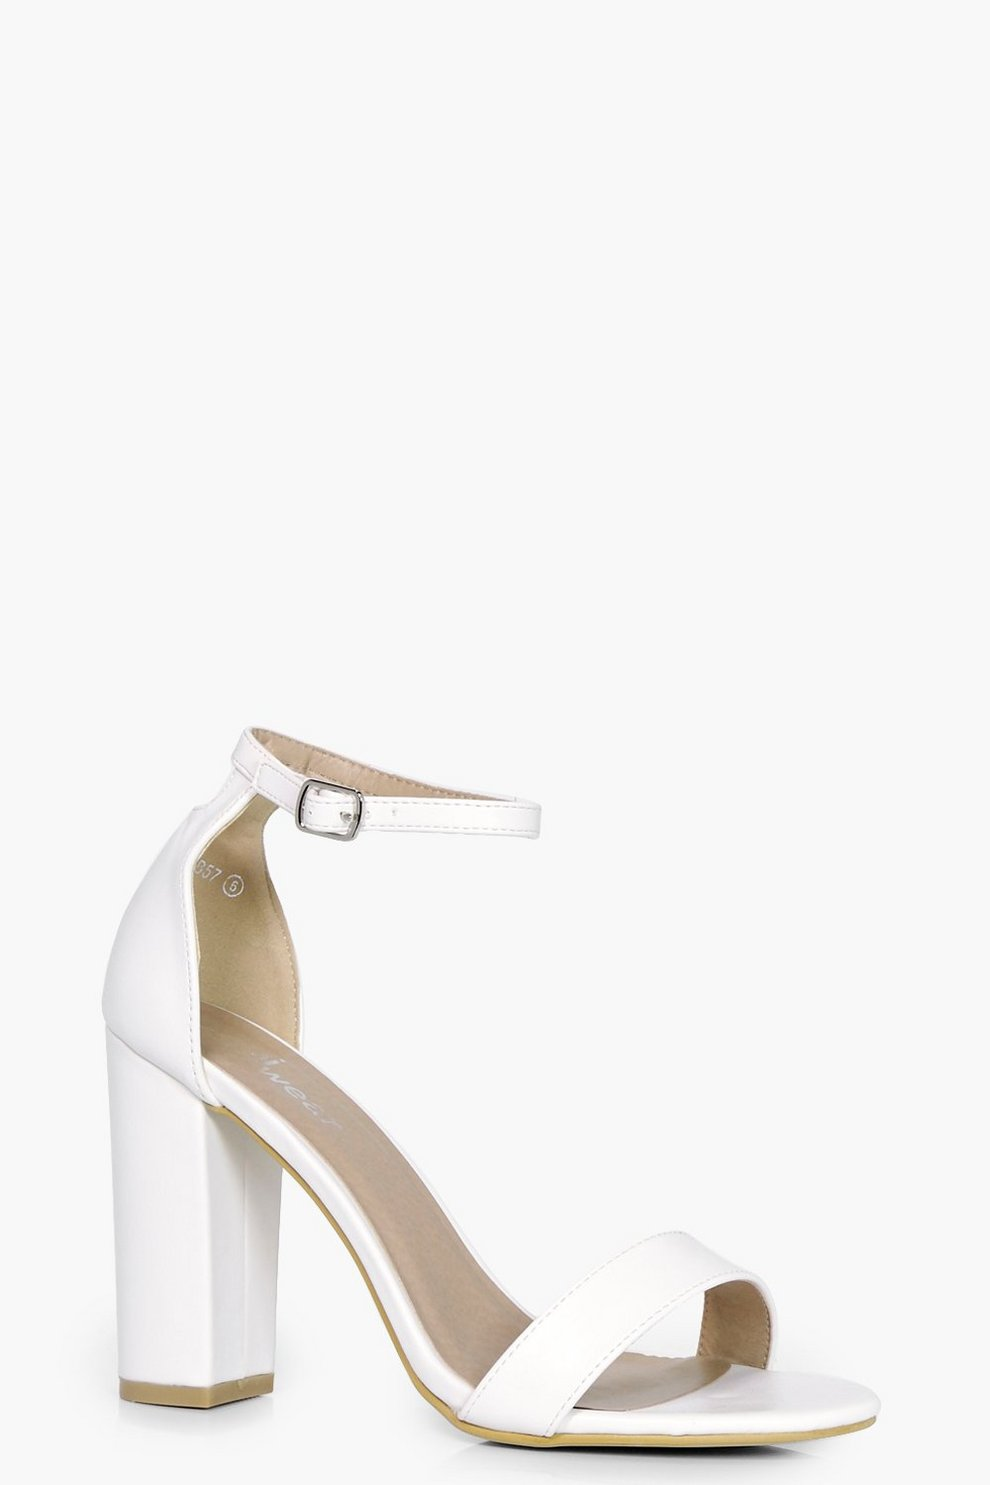 ab853ed111 2 Part Block Heels | Boohoo